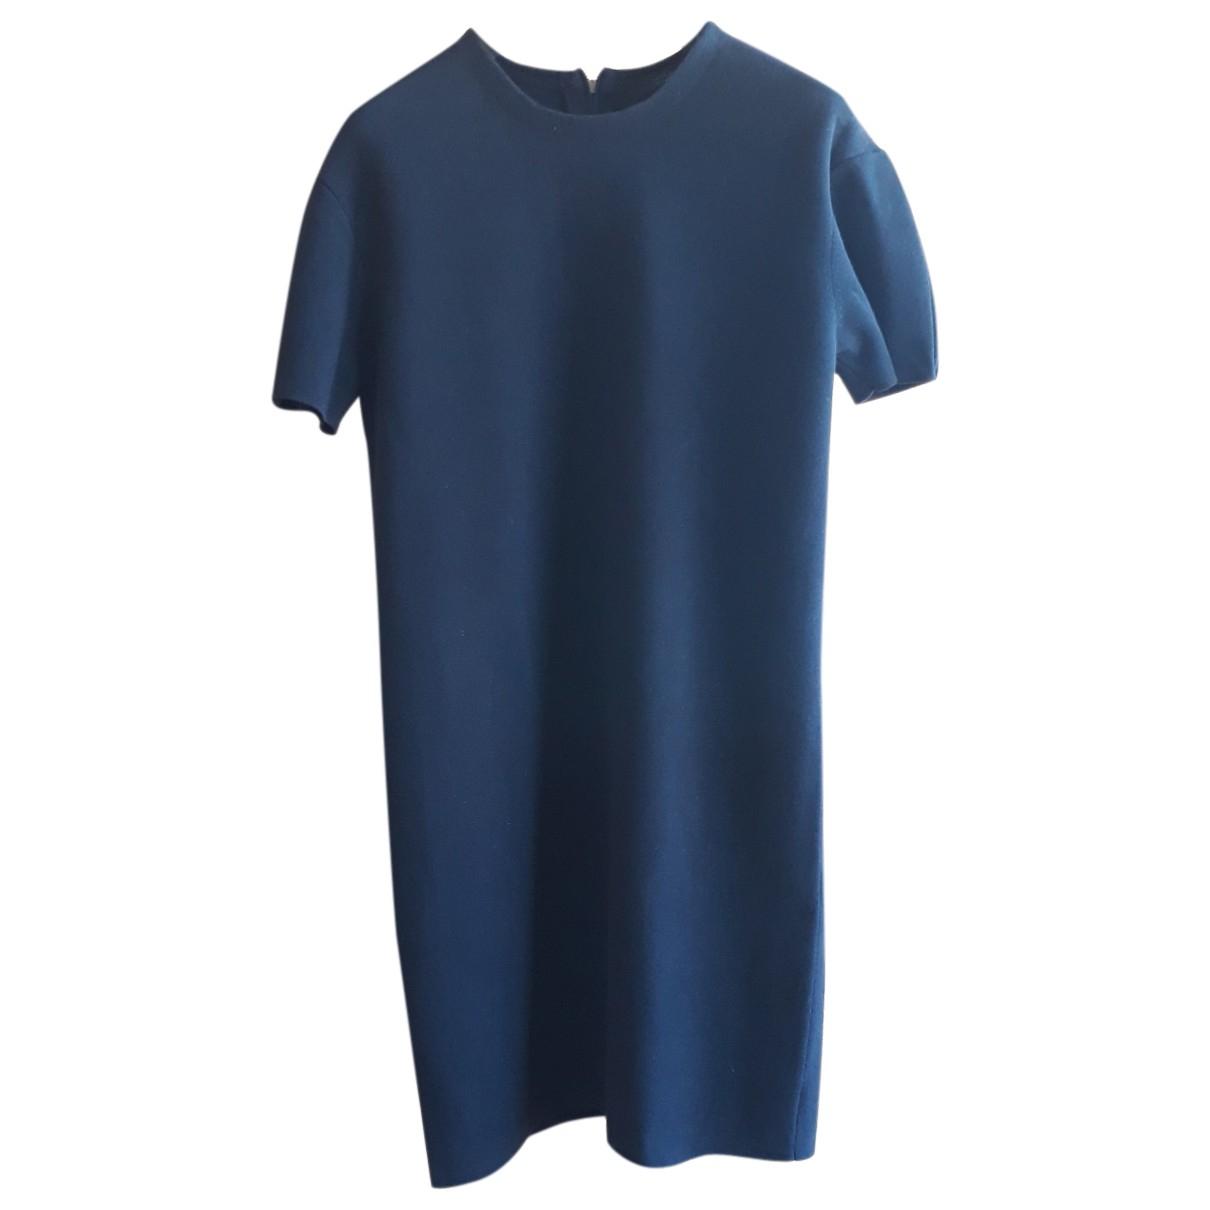 Cos N Blue Cotton dress for Women XS International